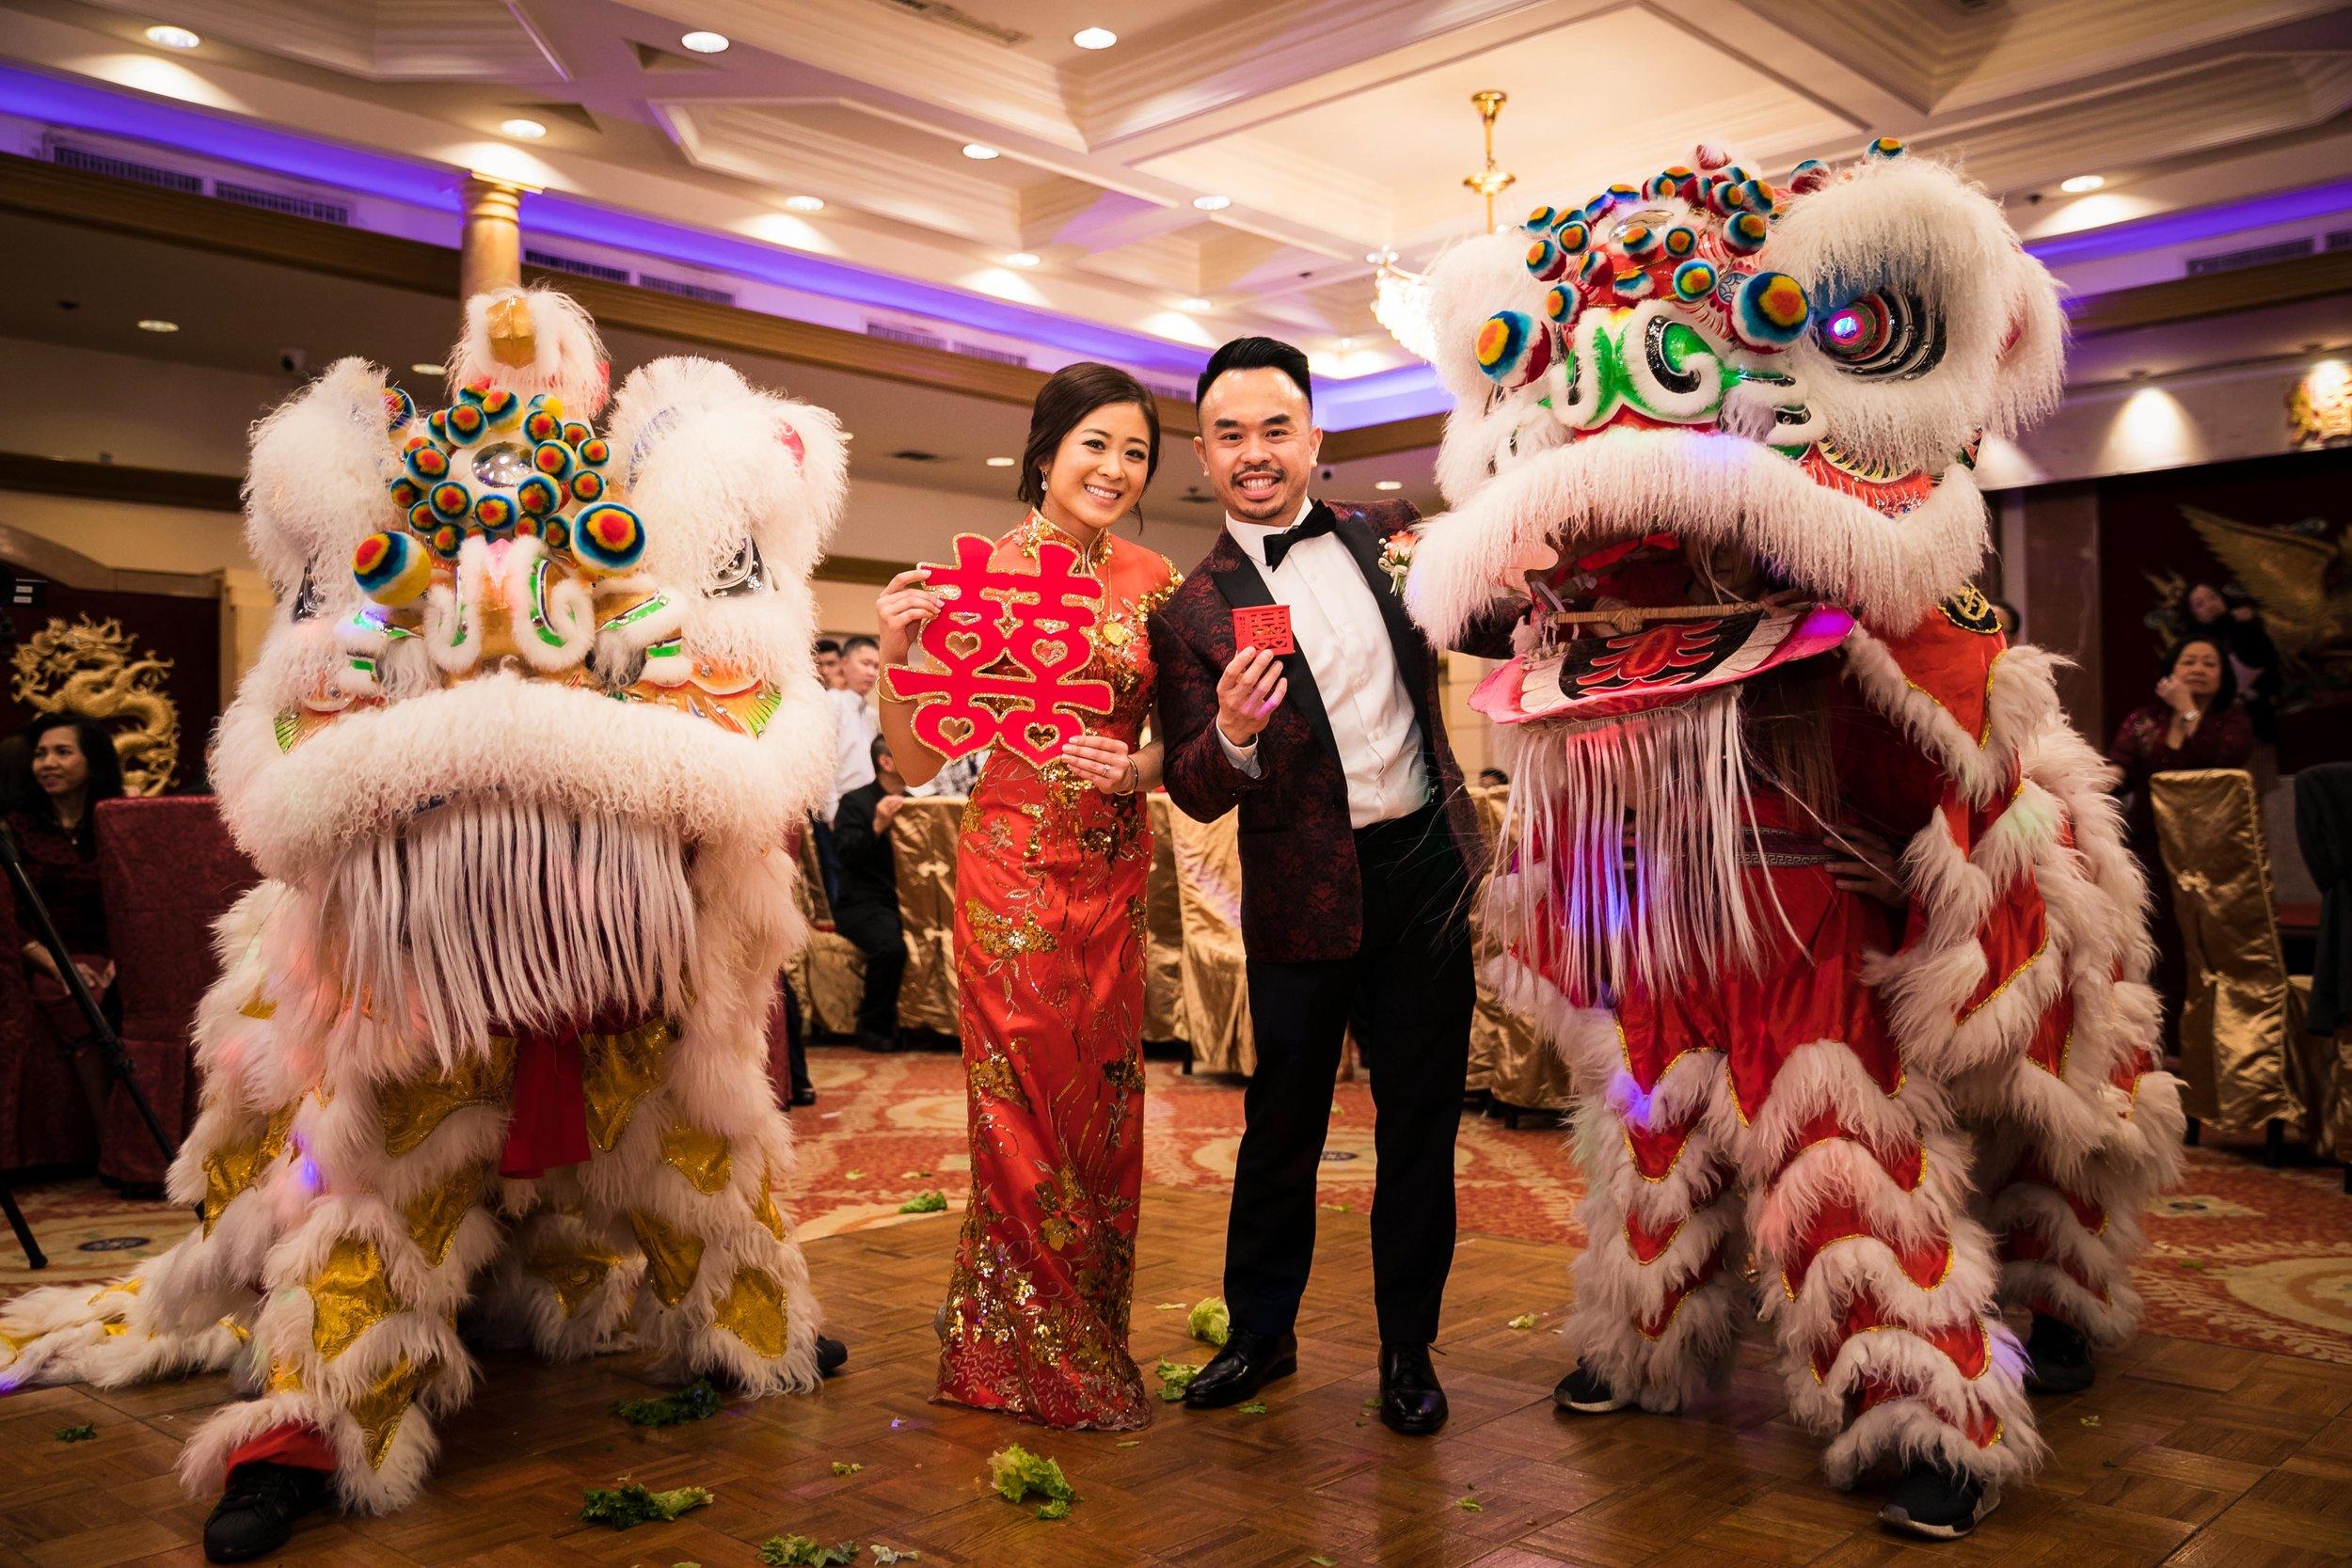 chinese_ reception_southern_california_wedding_joshuachun_photography-1.JPG